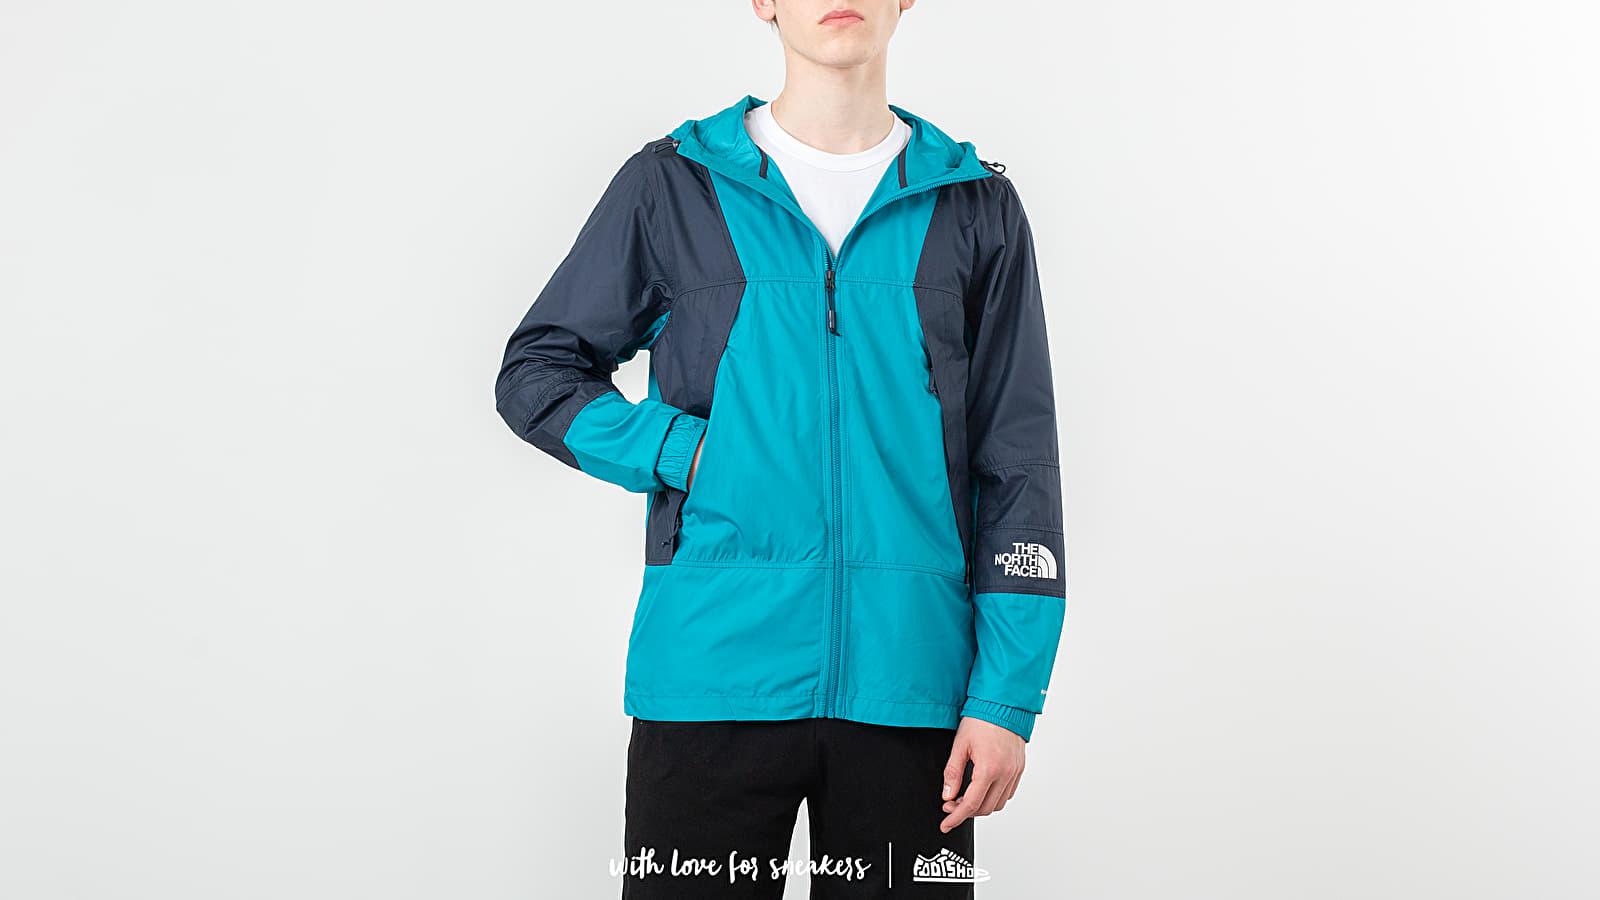 The North Face Mountain Light Windshell Jacket Crystal Teal za skvelú cenu 95 € kúpite na Footshop.sk